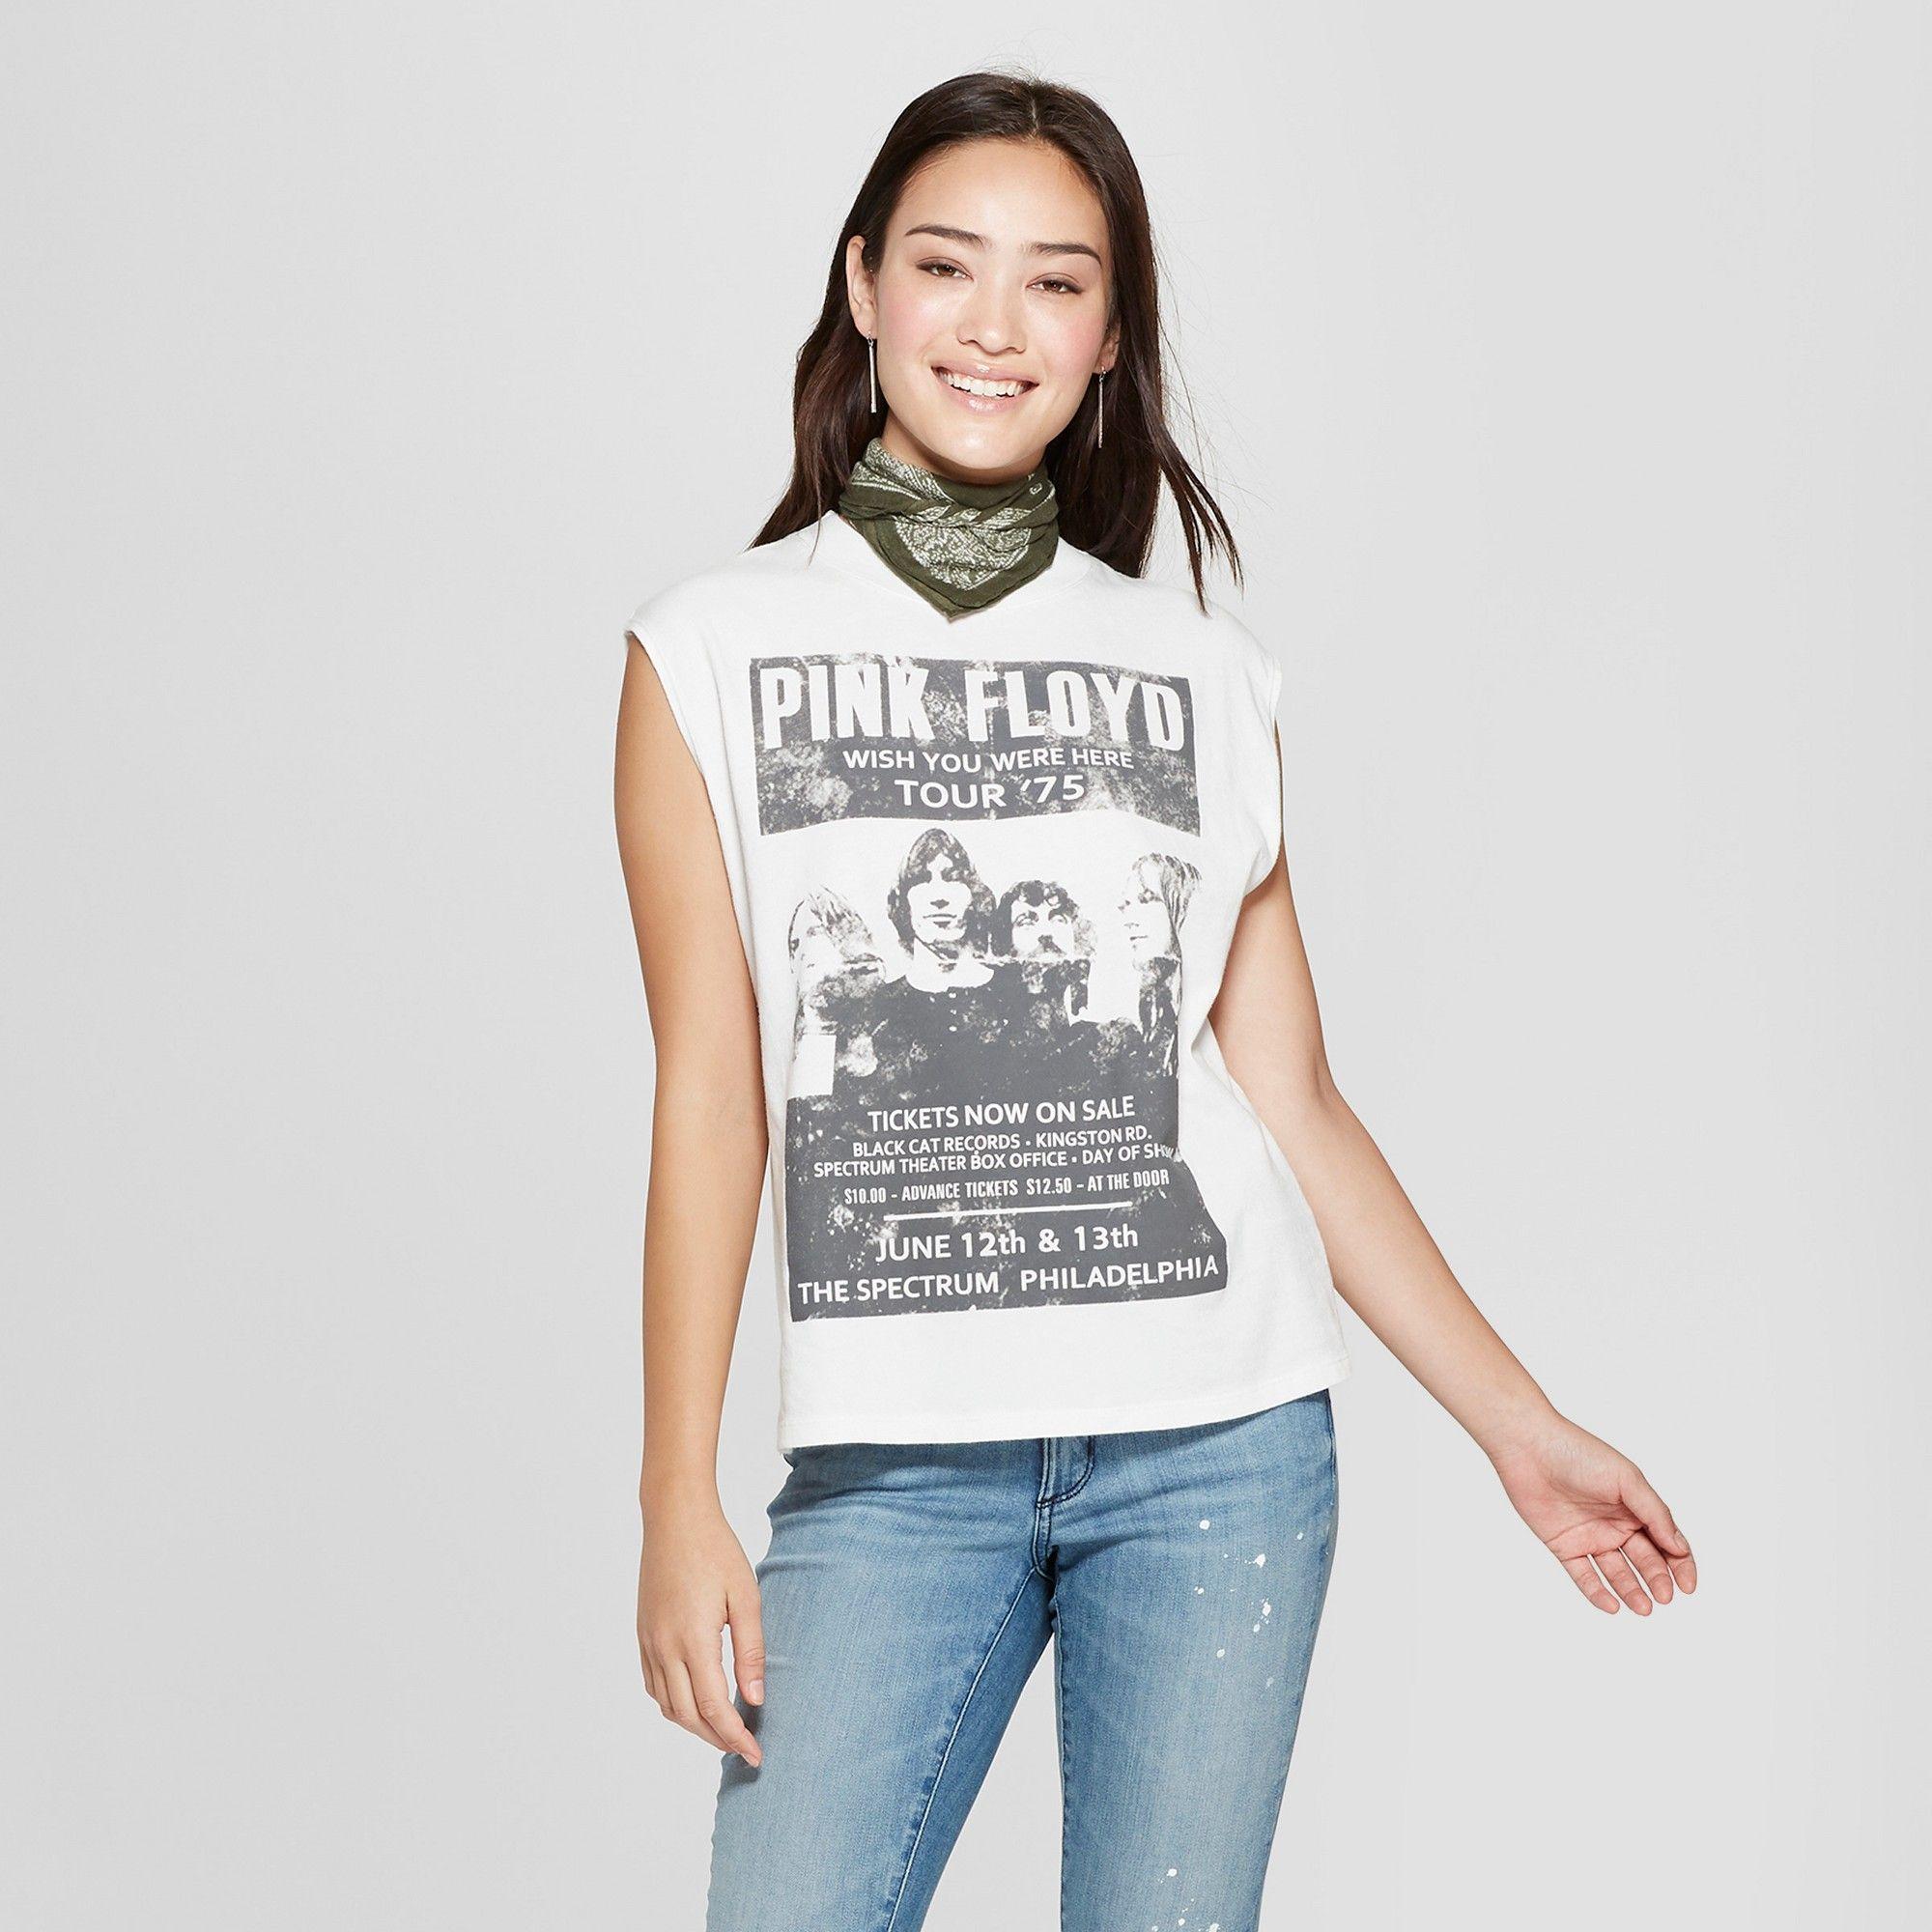 271a20284c Pink Floyd Shirts Target